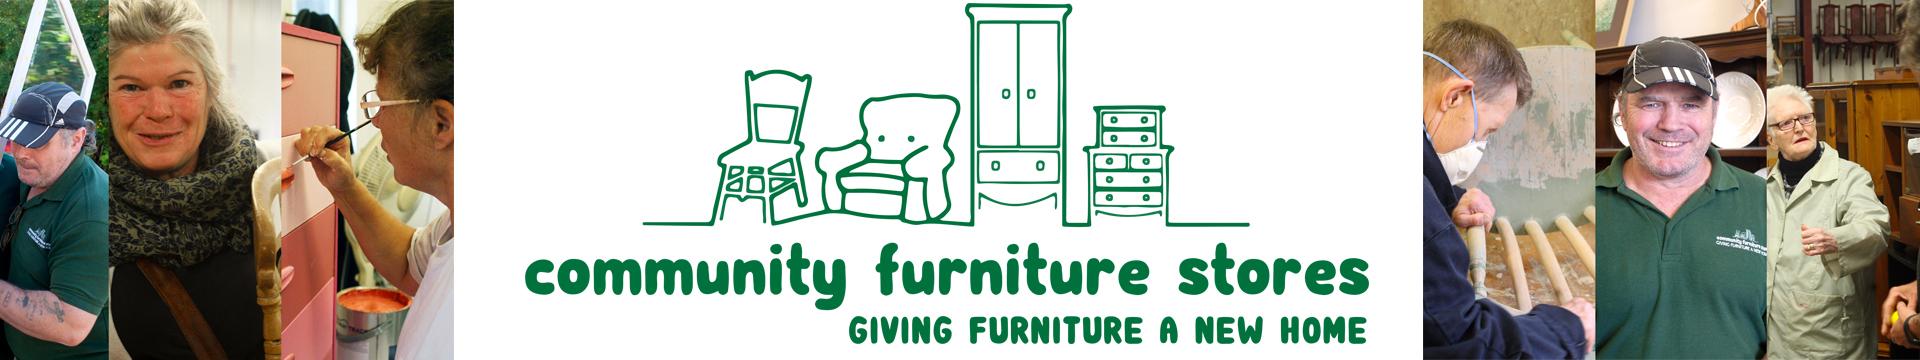 communityfurniturestore.co.uk